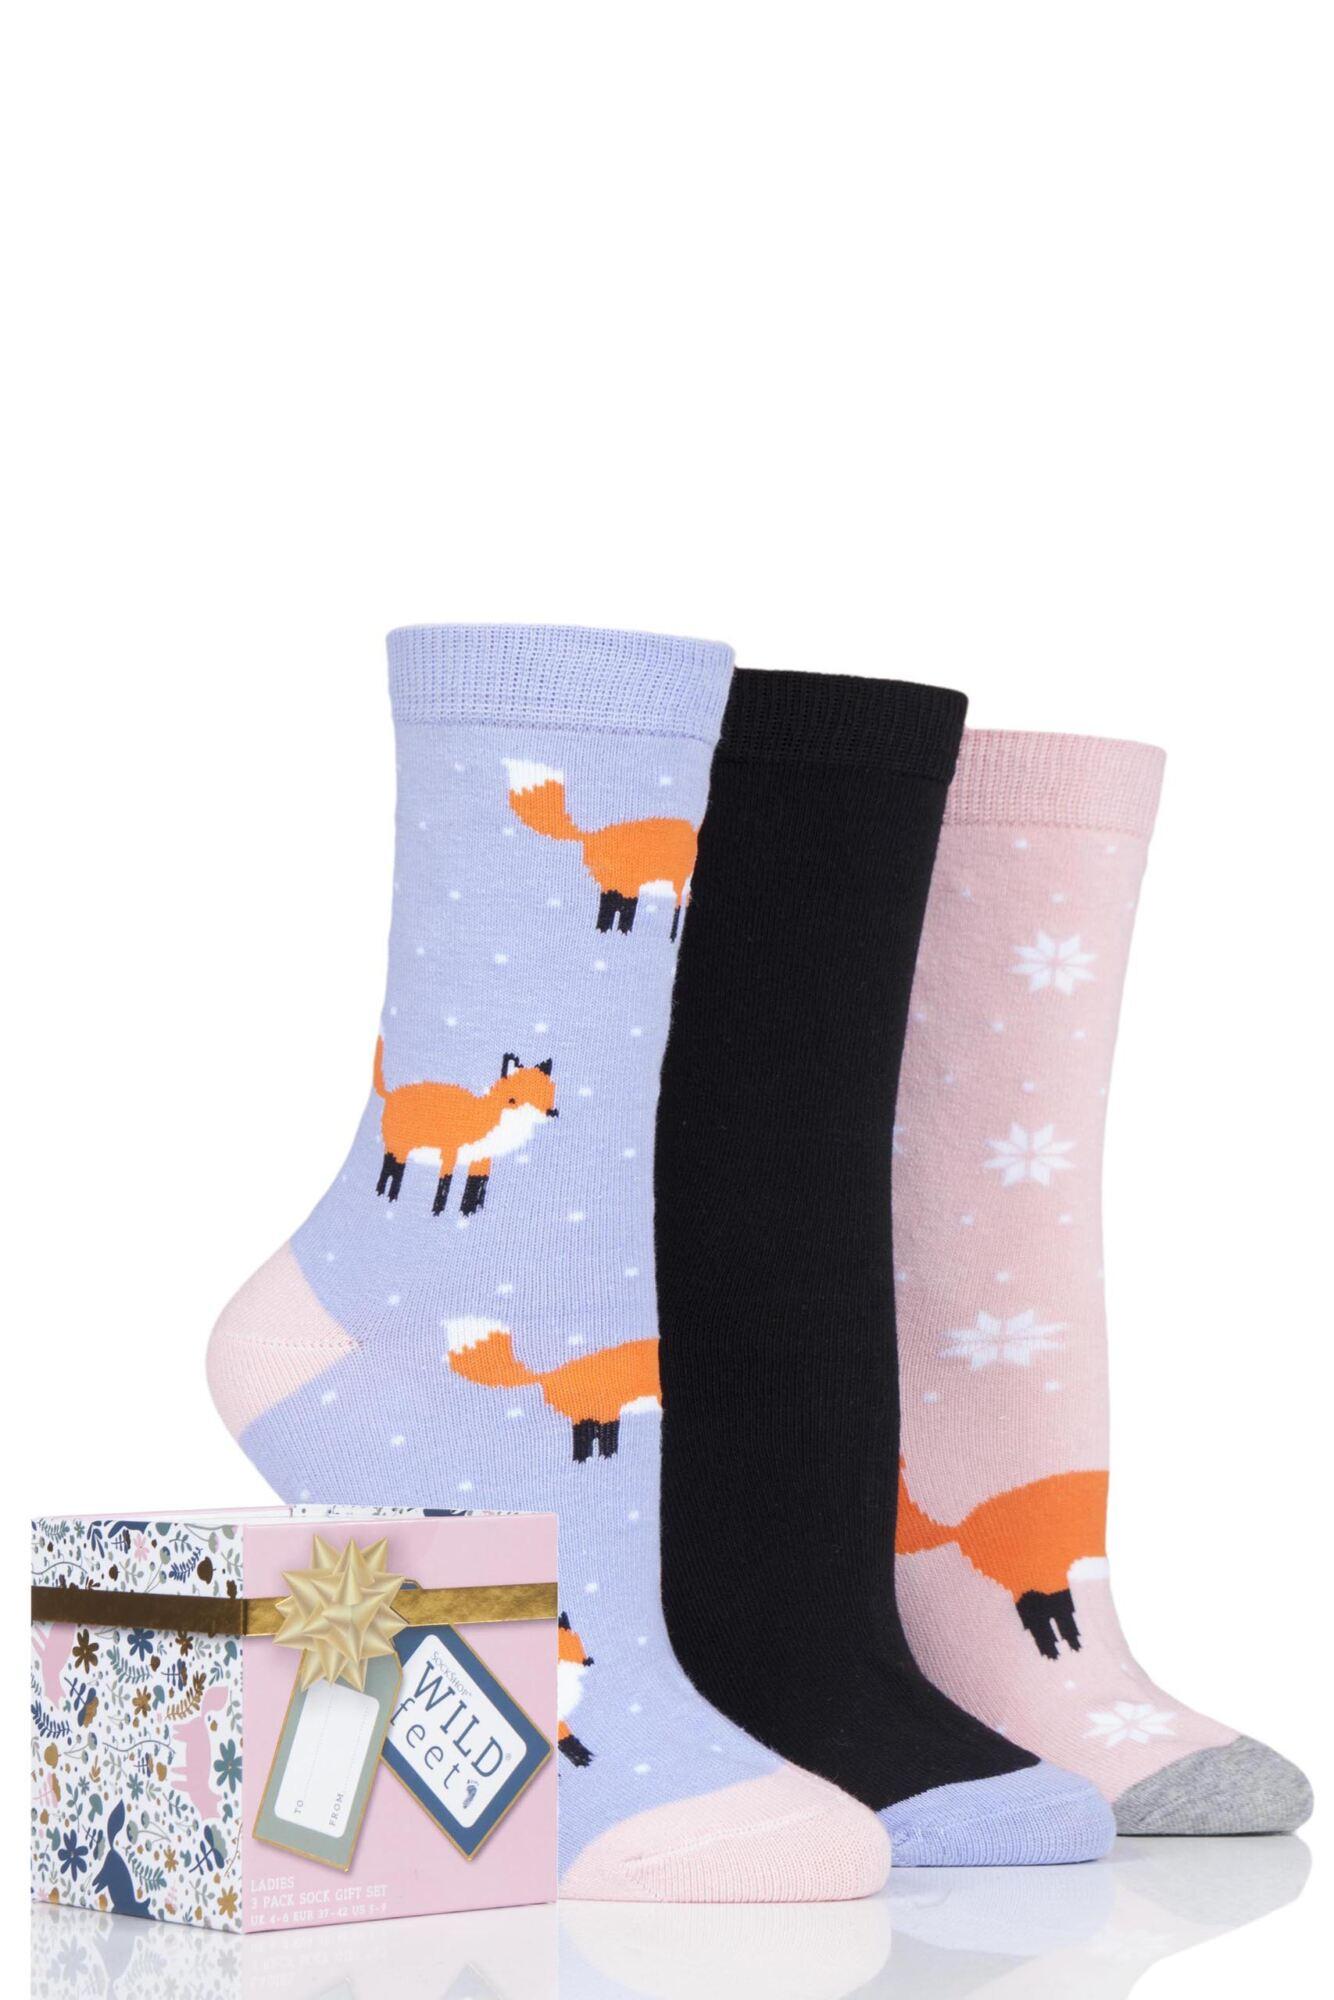 3 Pair Gift Boxed Novelty Cotton Socks Ladies - Wild Feet